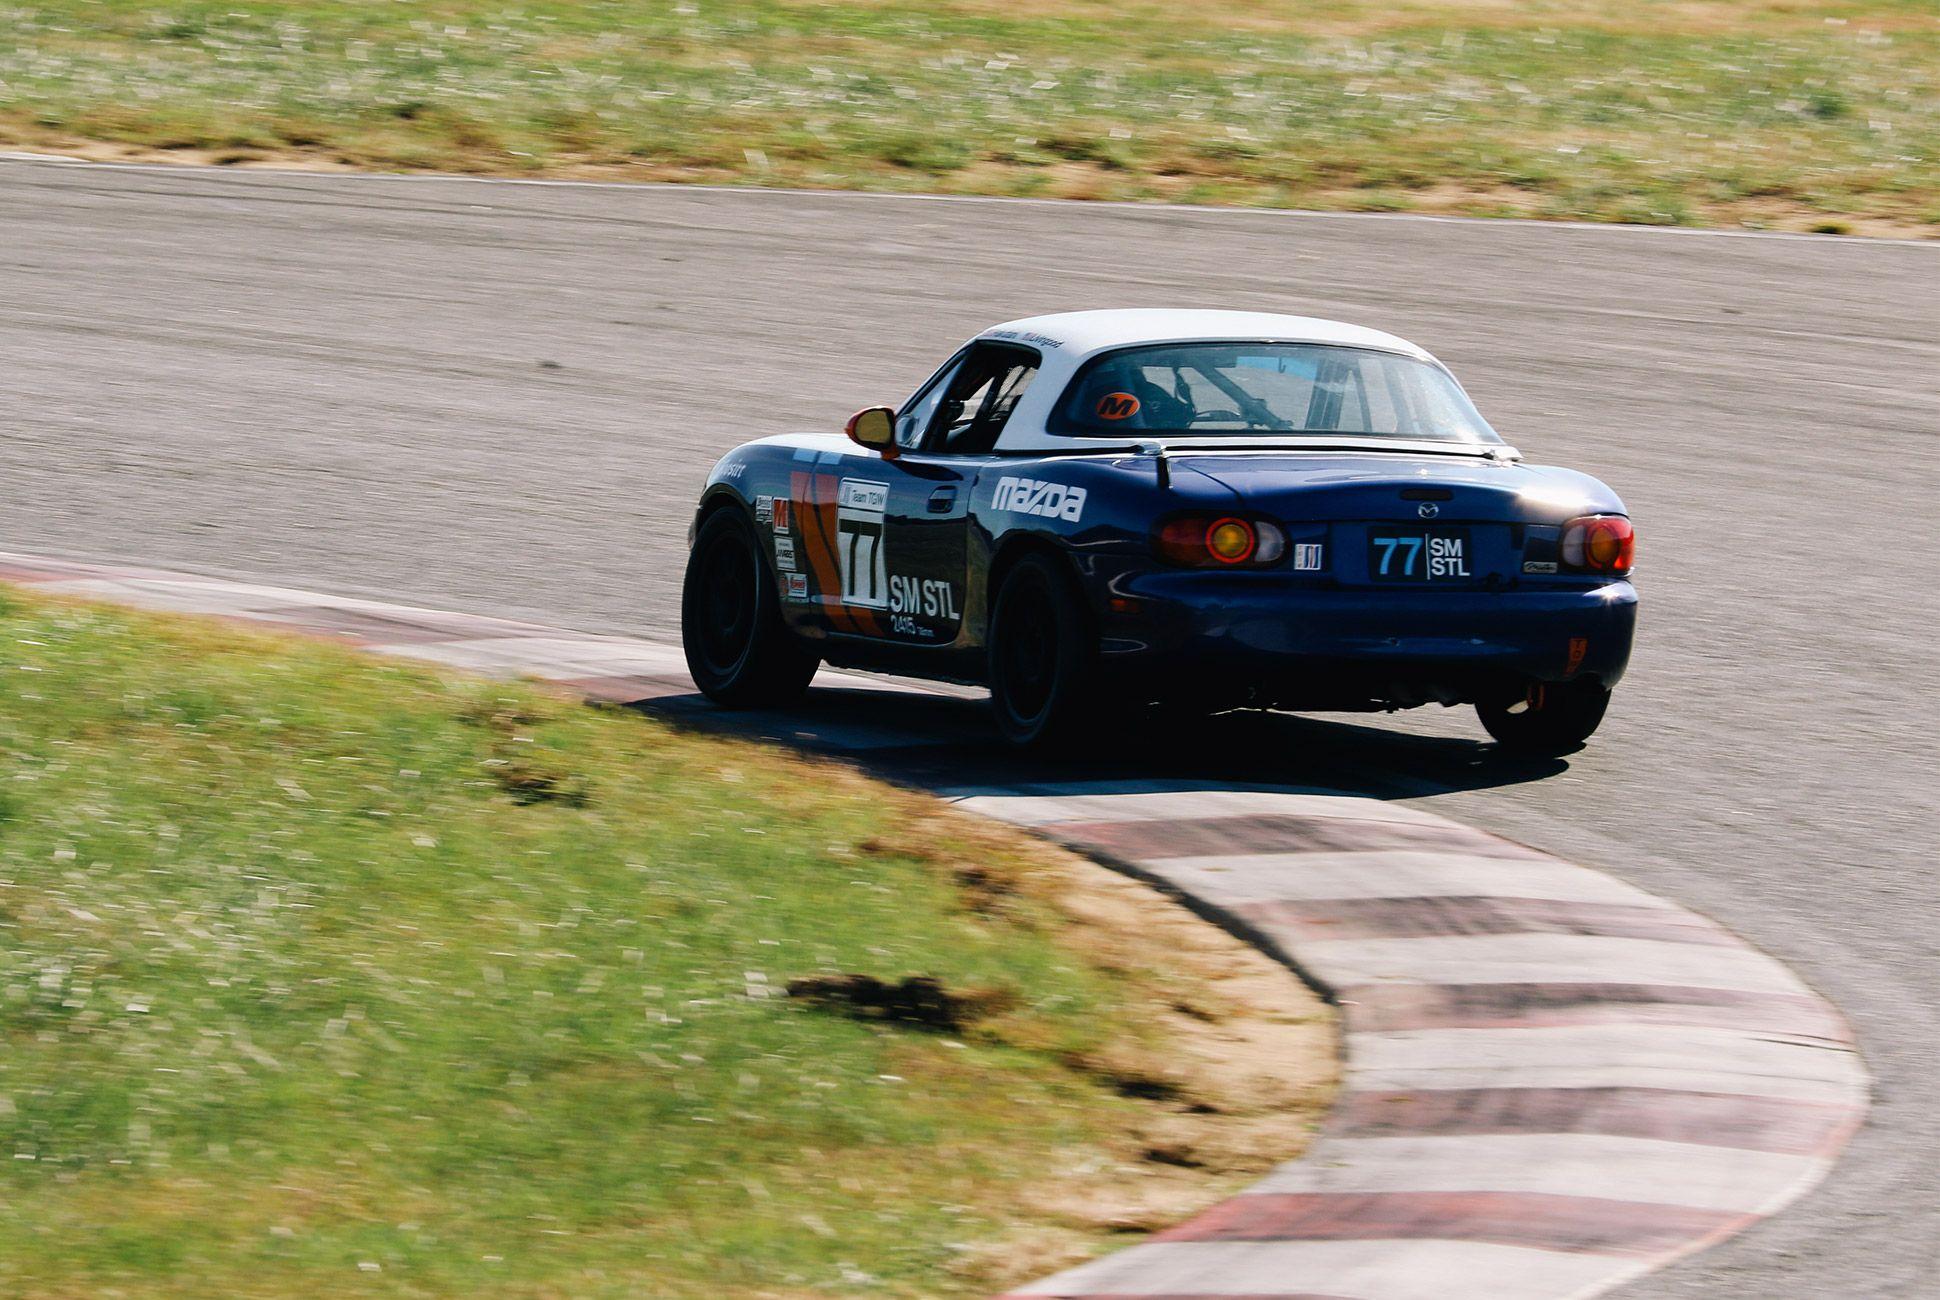 Mazda-Miata-The-Best-Vintage-Sportscar-gear-patrol-10